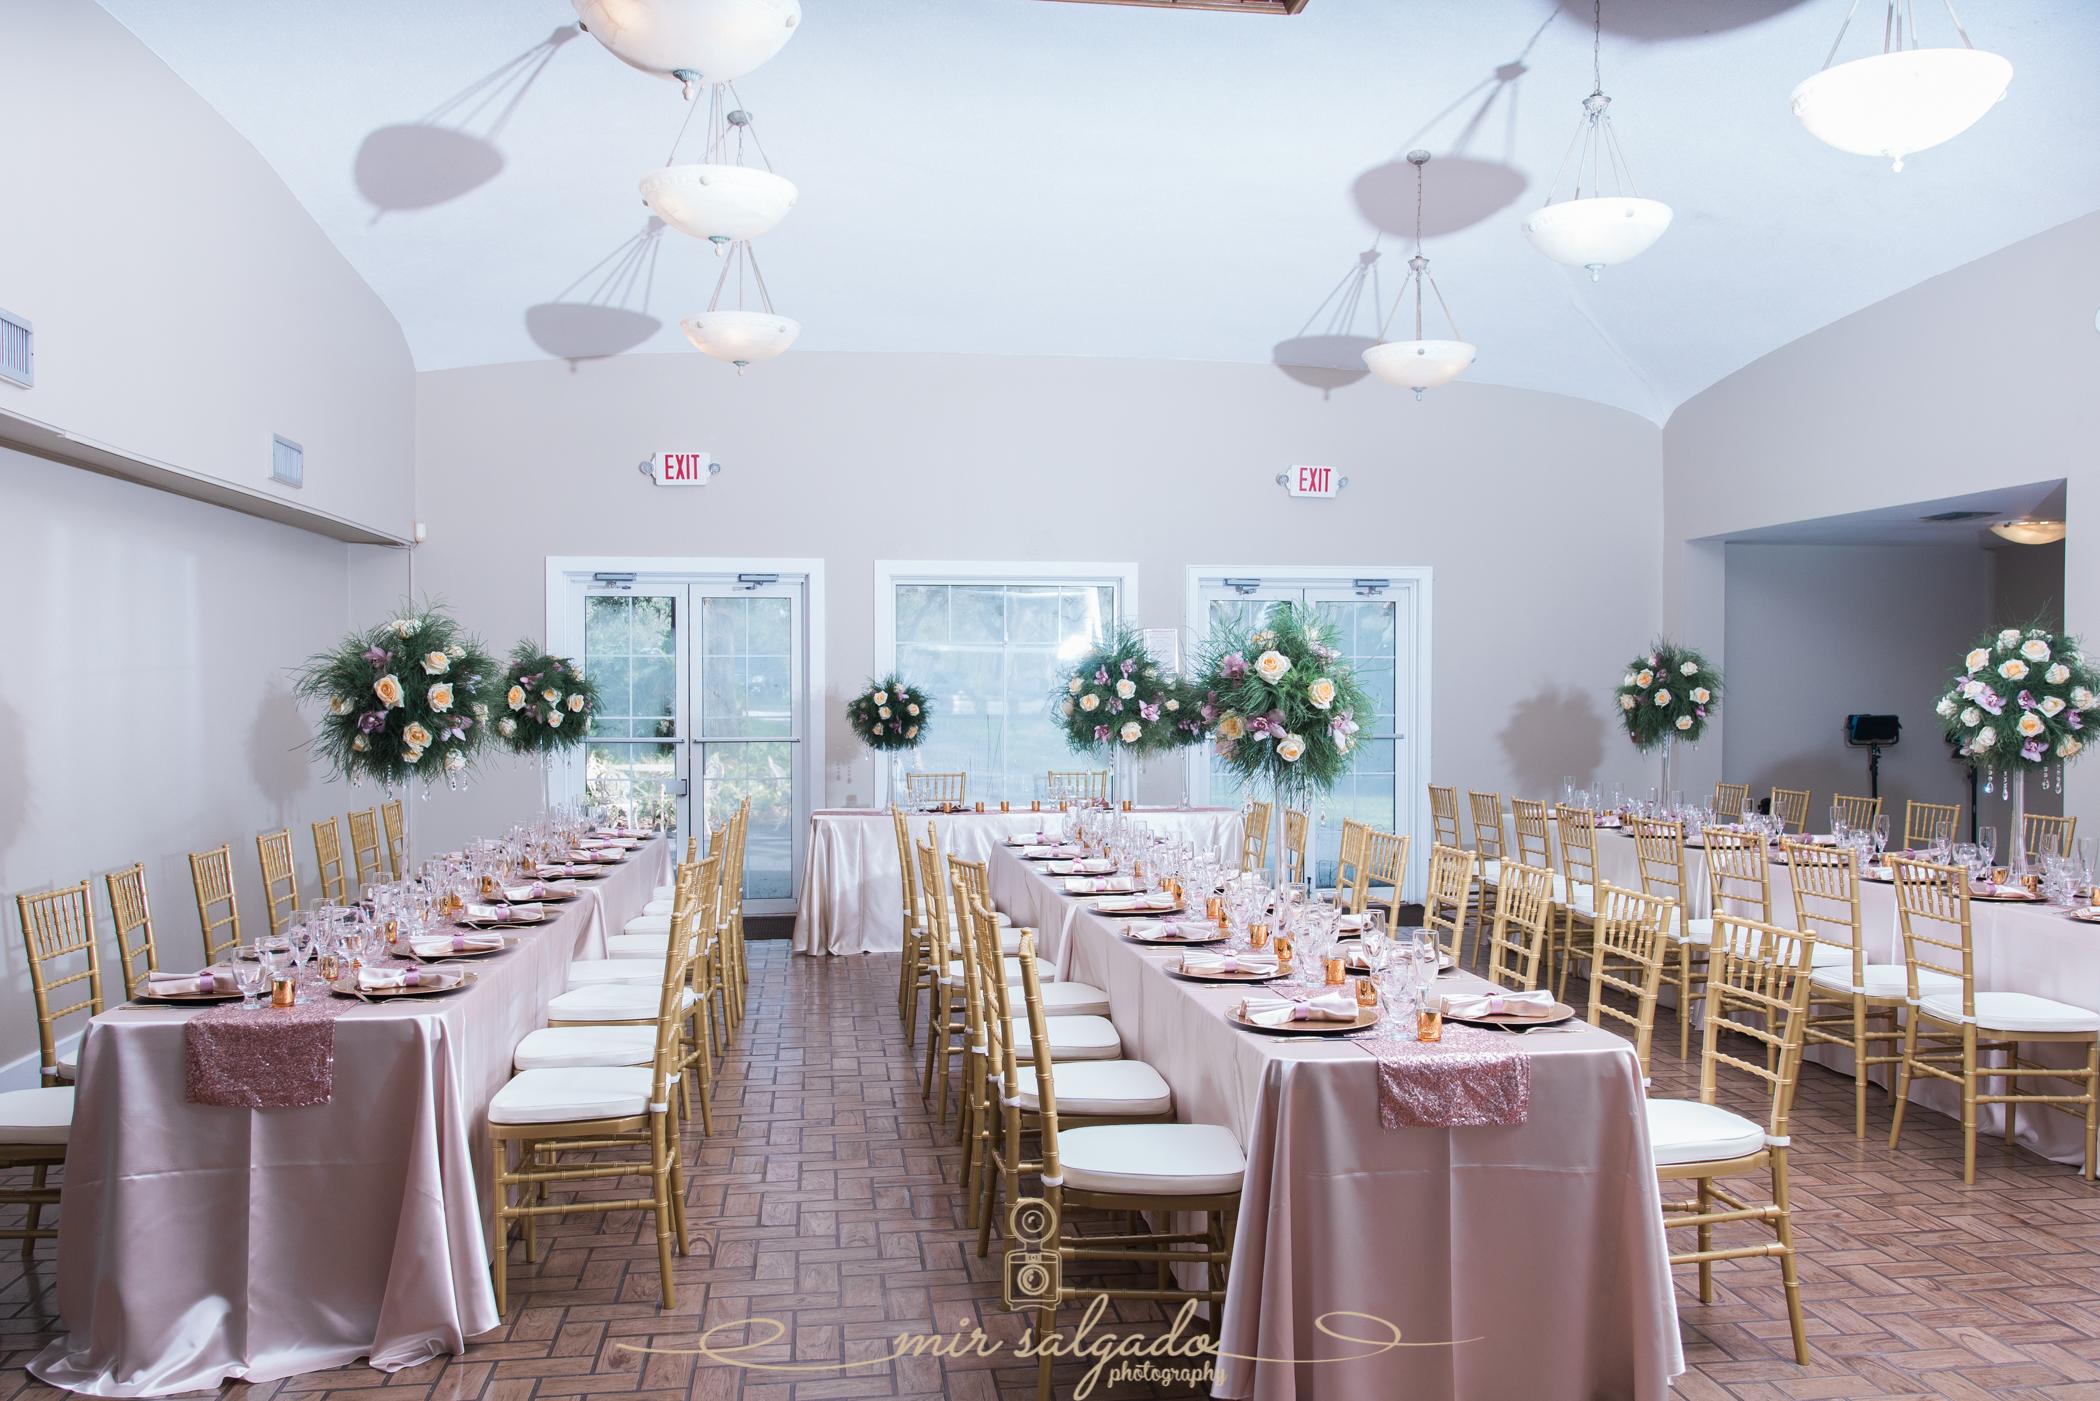 Bok-tower-gardens-wedding-decoration-photo, Tampa-wedding-photo